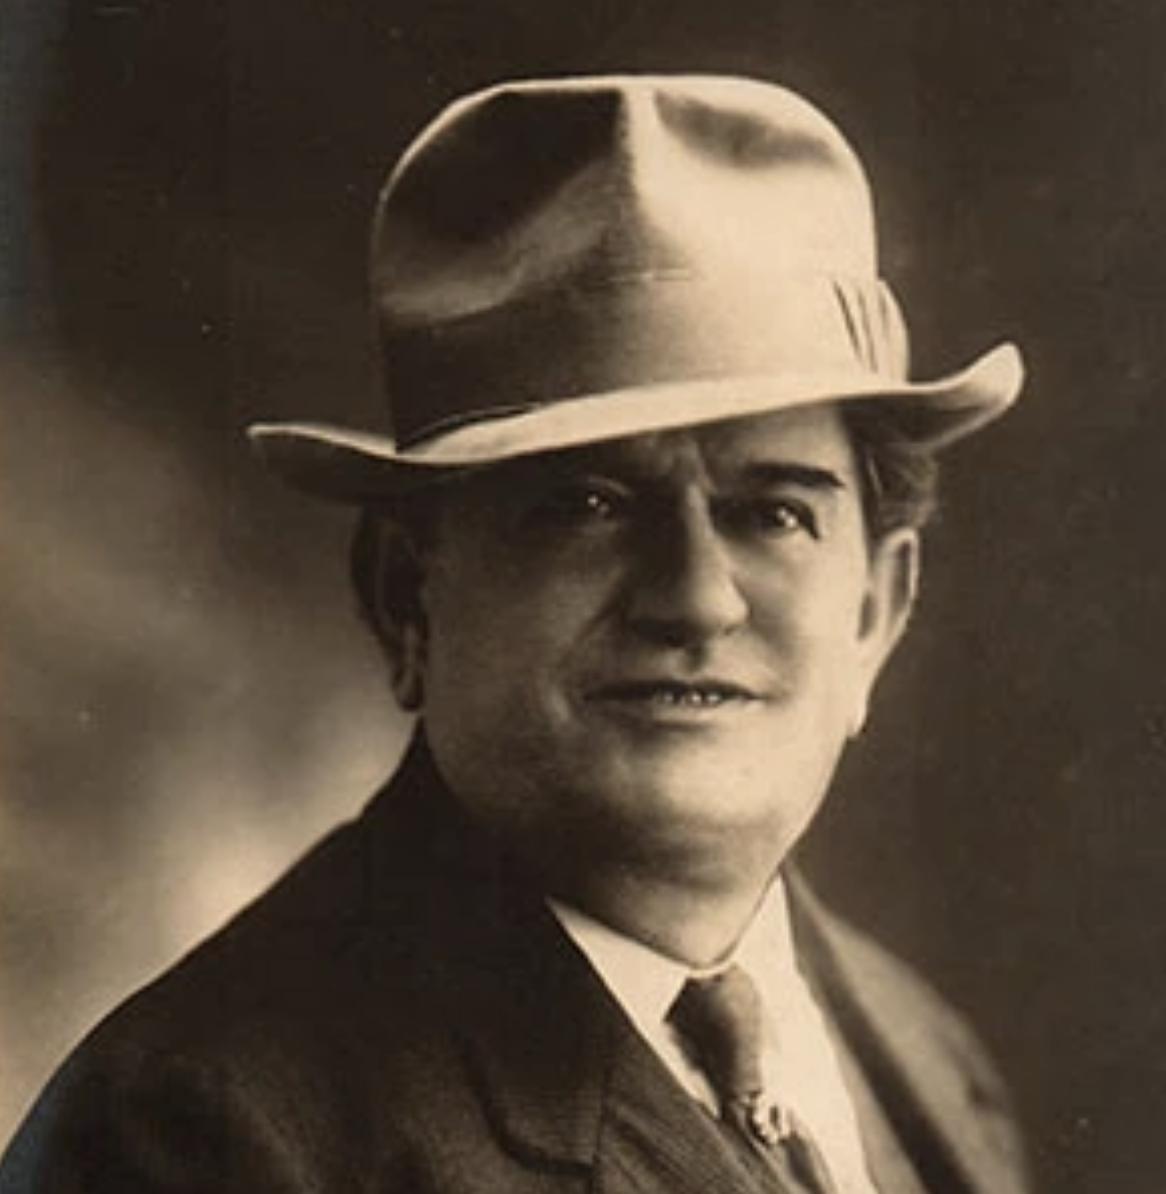 Pini-Corsi photo portrait c. 1914